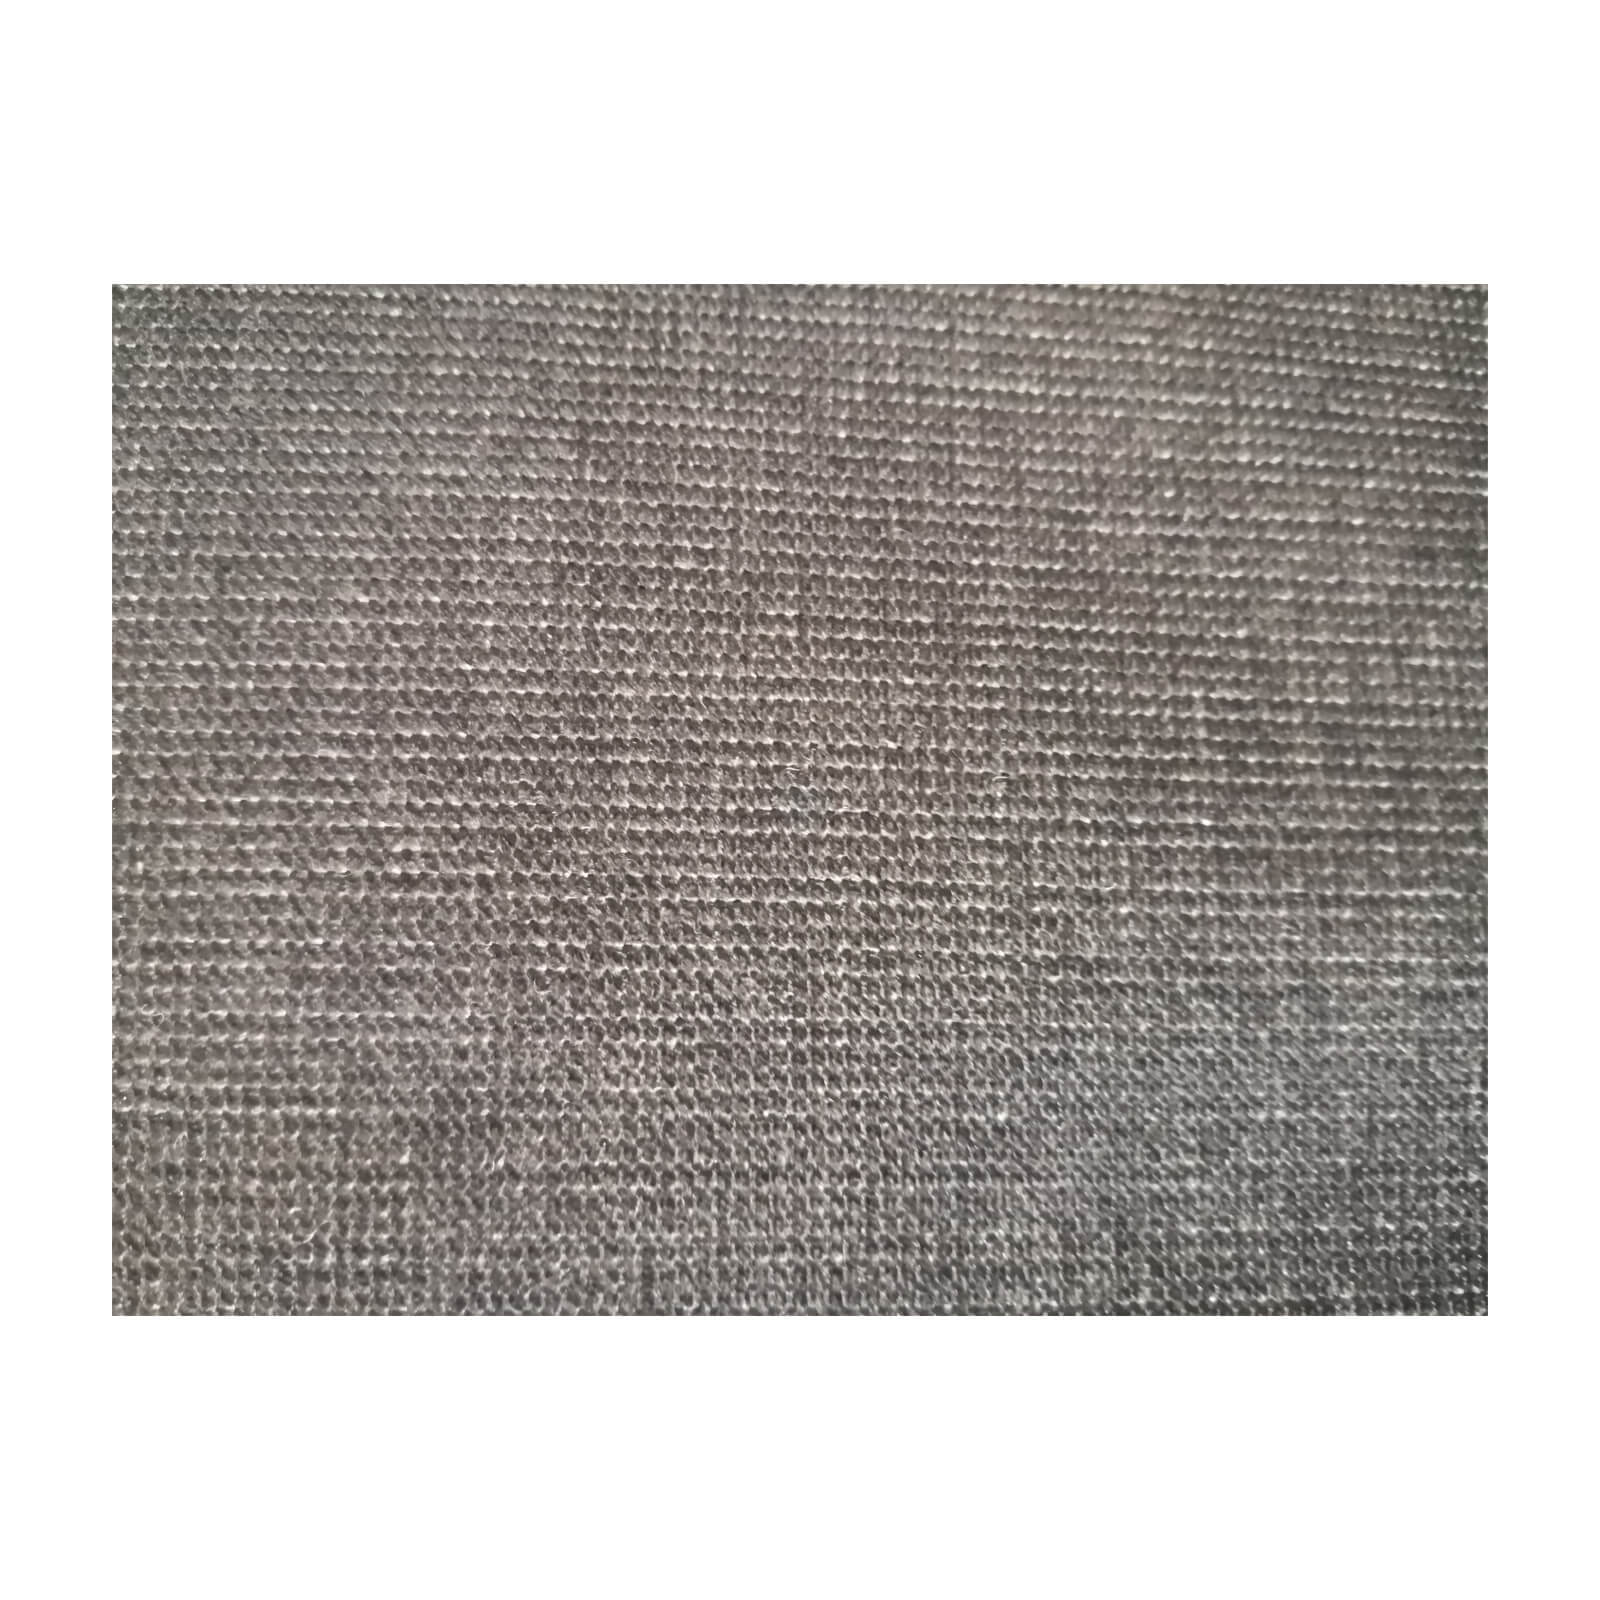 Two Design Lovers B&B Italia Arne sofa anthracite fabric